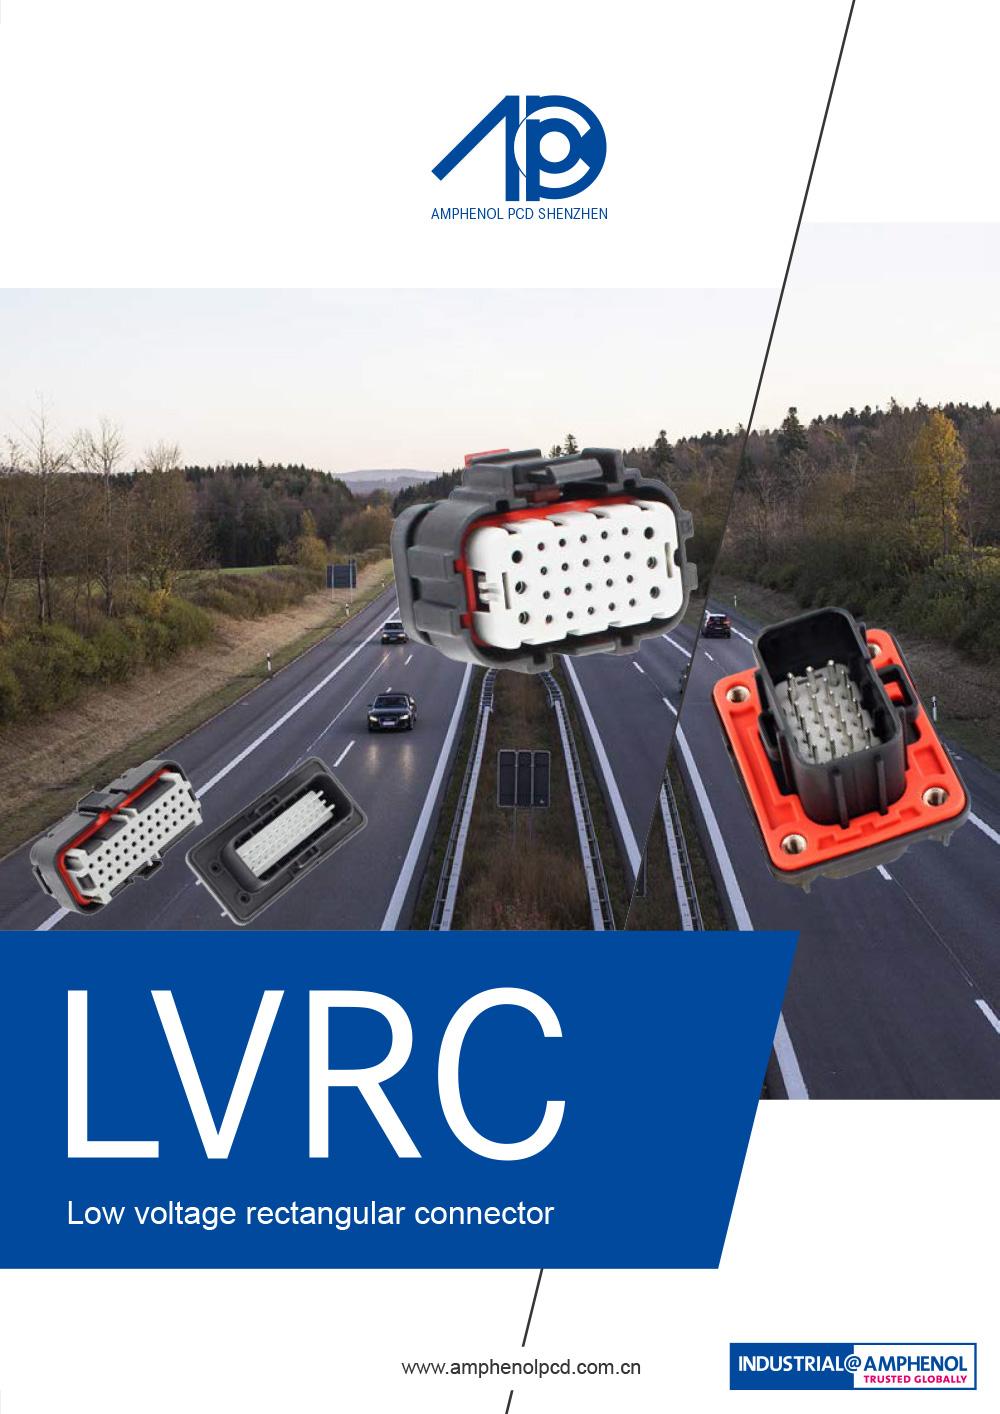 LVRC (Low Voltage Rectangular Connectors)